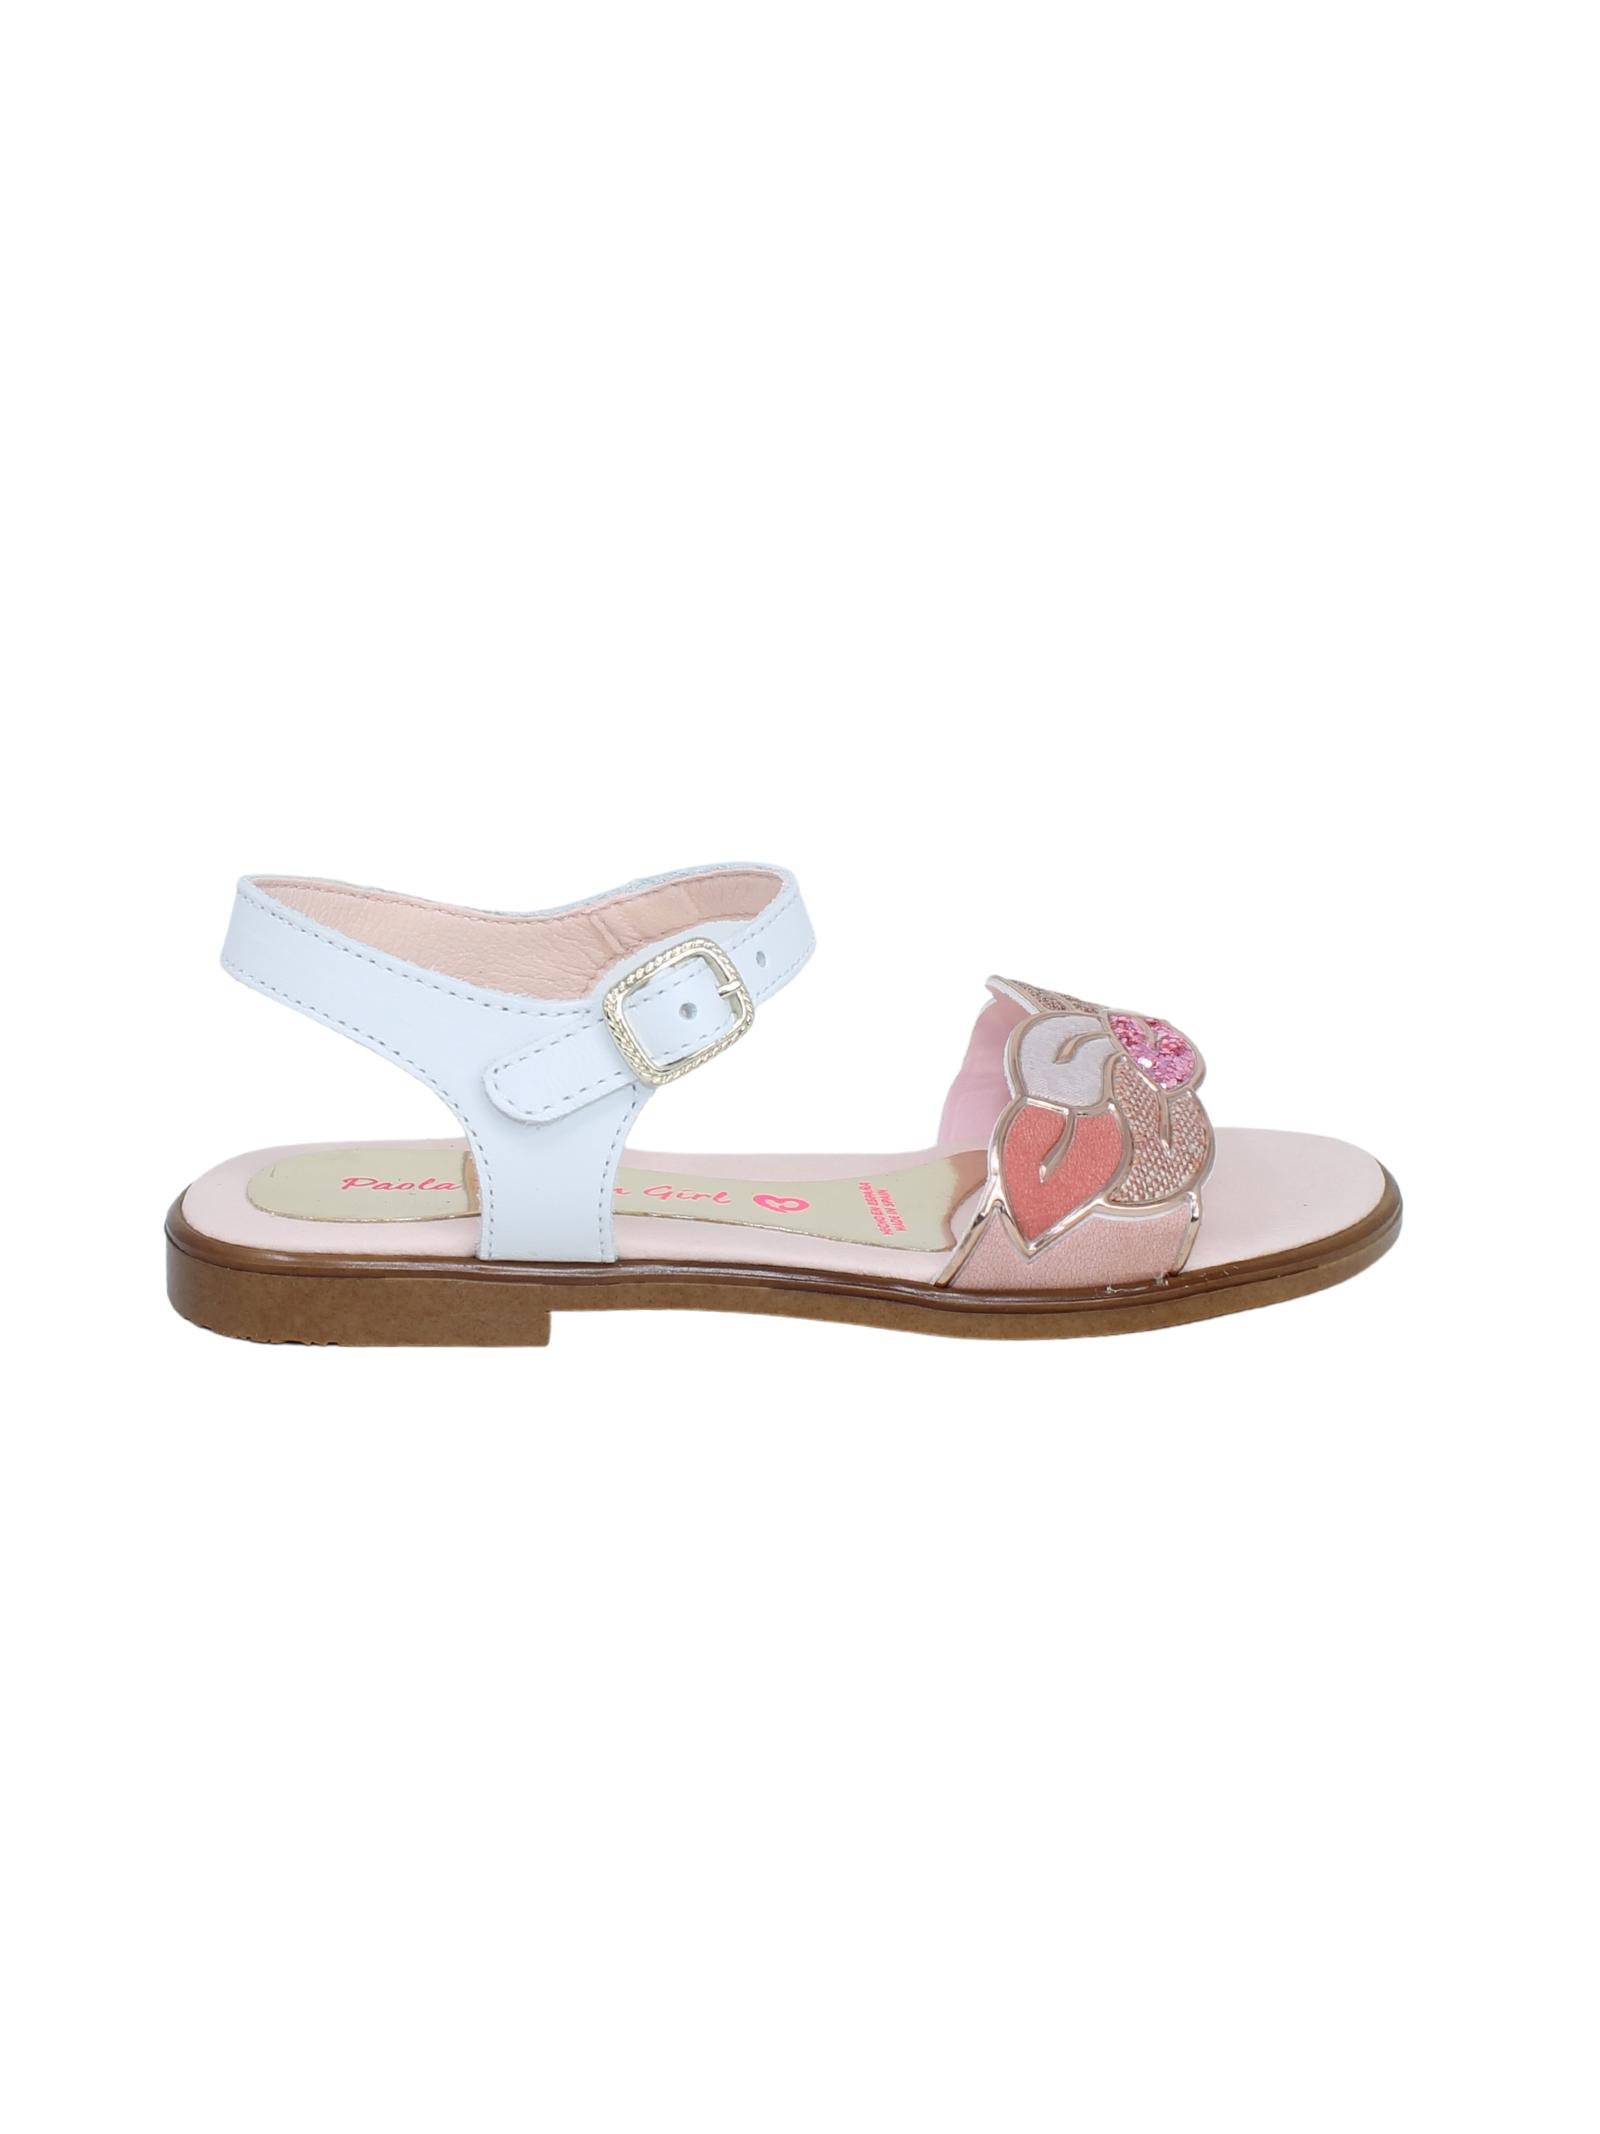 Sandalo Bambina Glitter PABLOSKY | Sandali | 861000ROSA